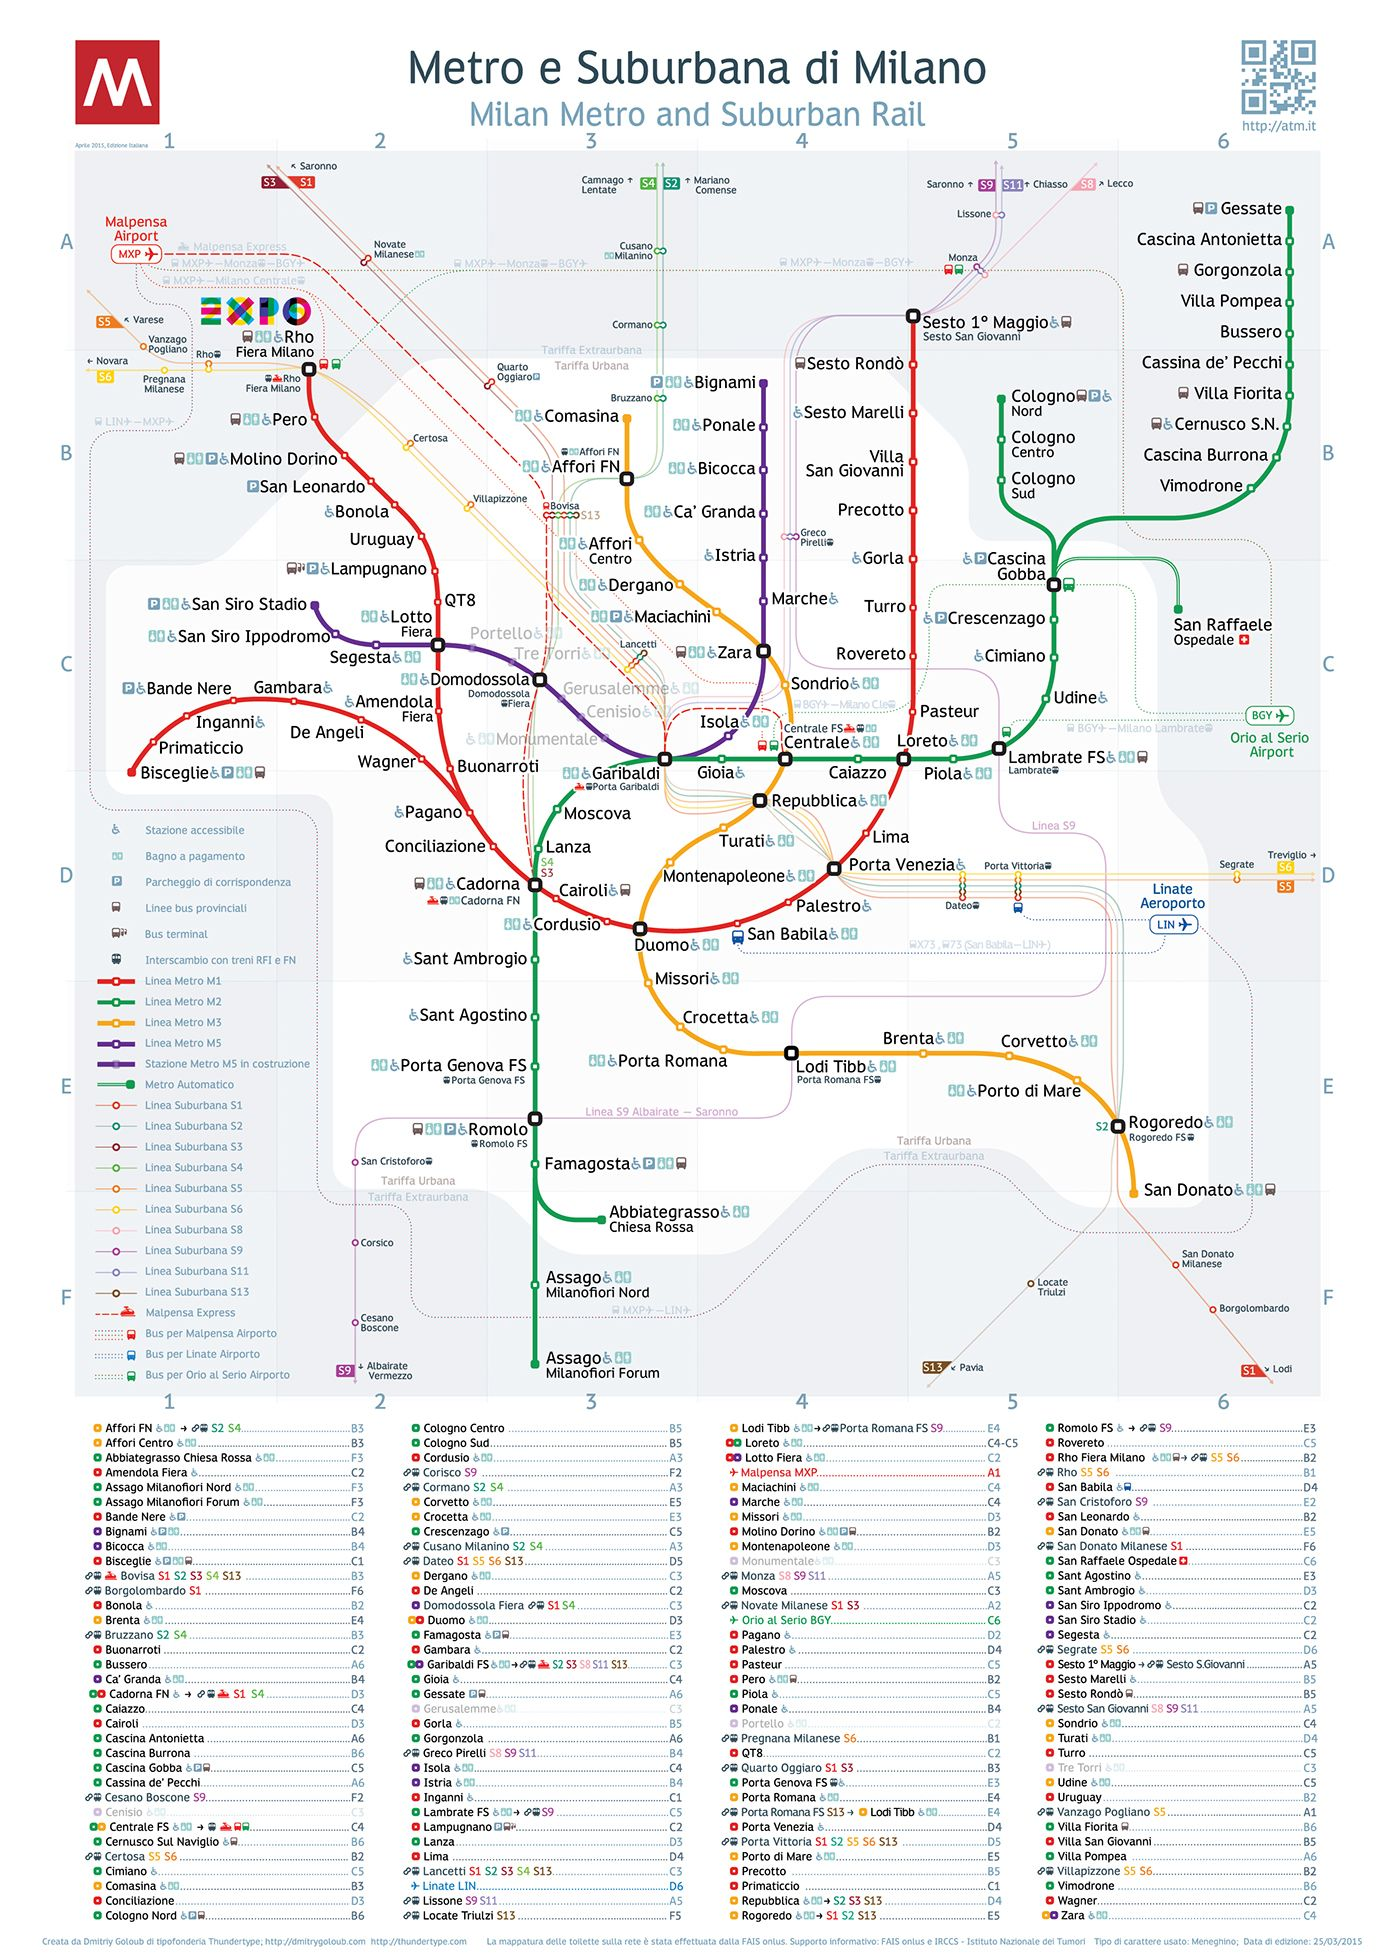 Milan Metro Map Bildgestalter http://www.bildgestalter.net ...